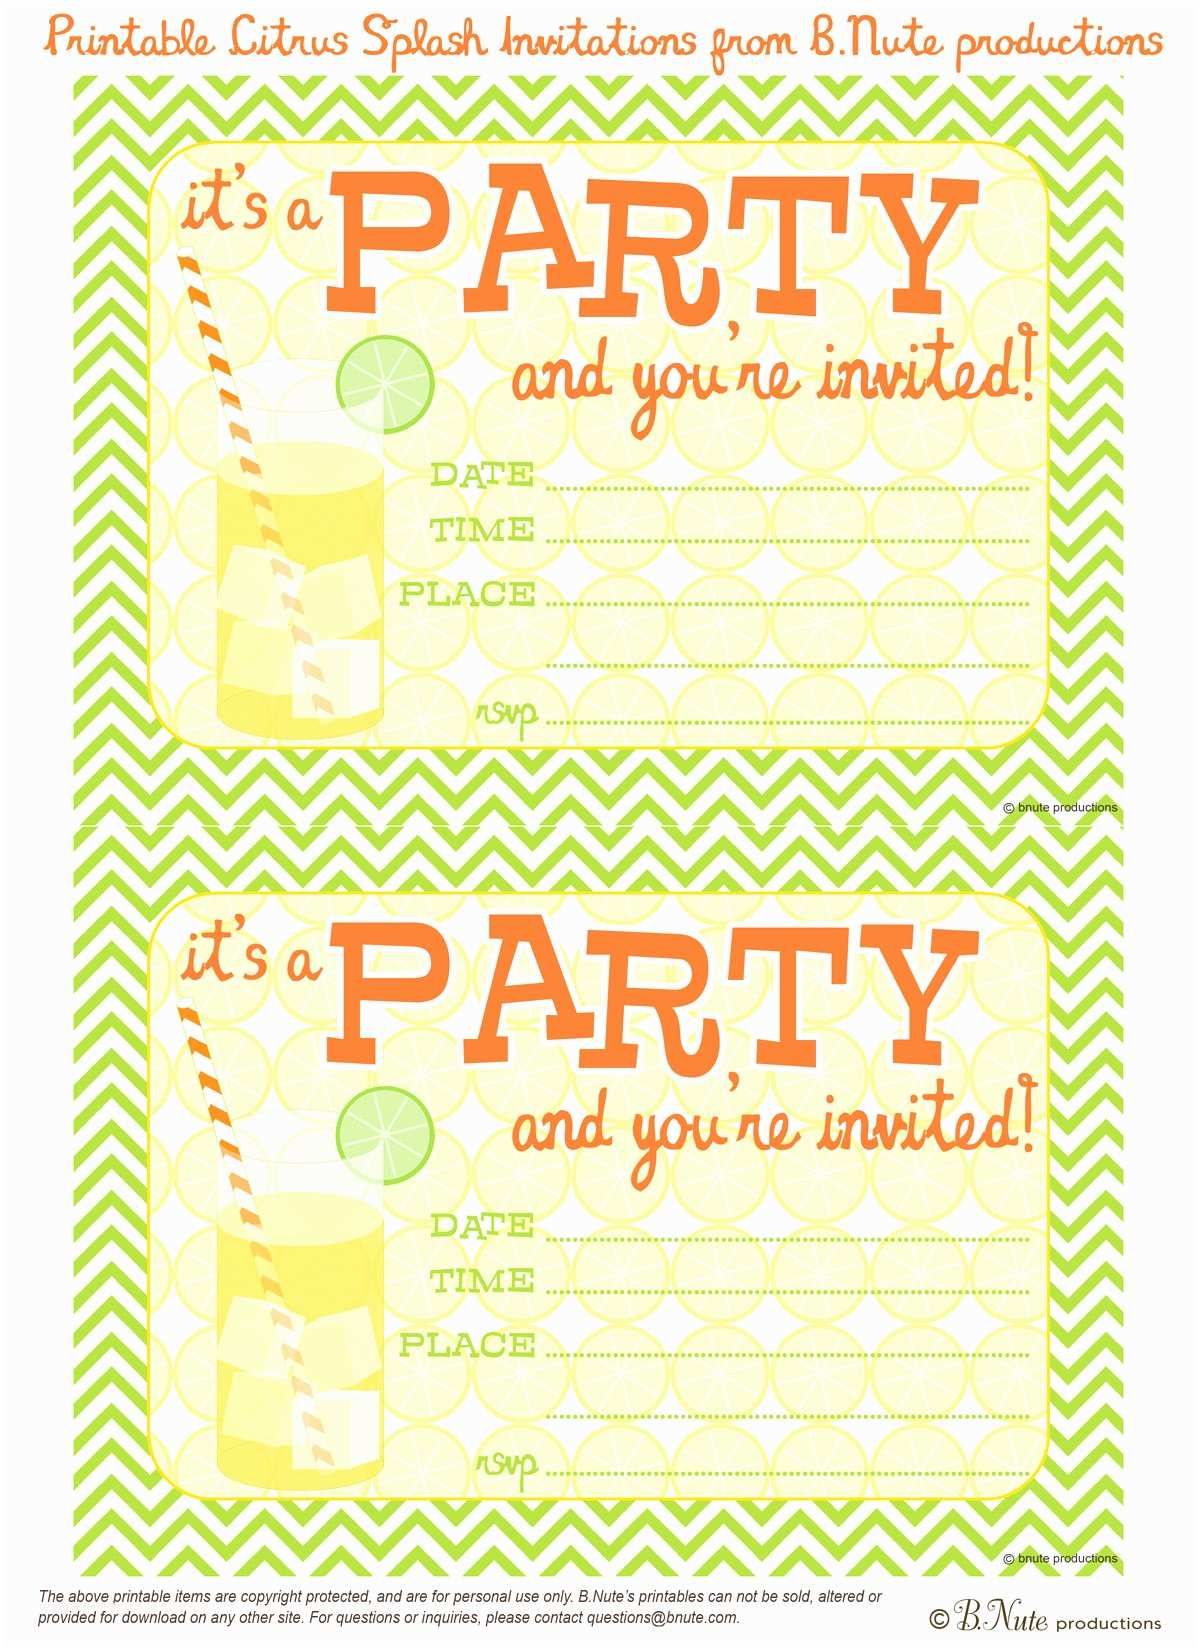 Free Party Invitations Bnute Productions Free Printable Citrus Splash Invitations